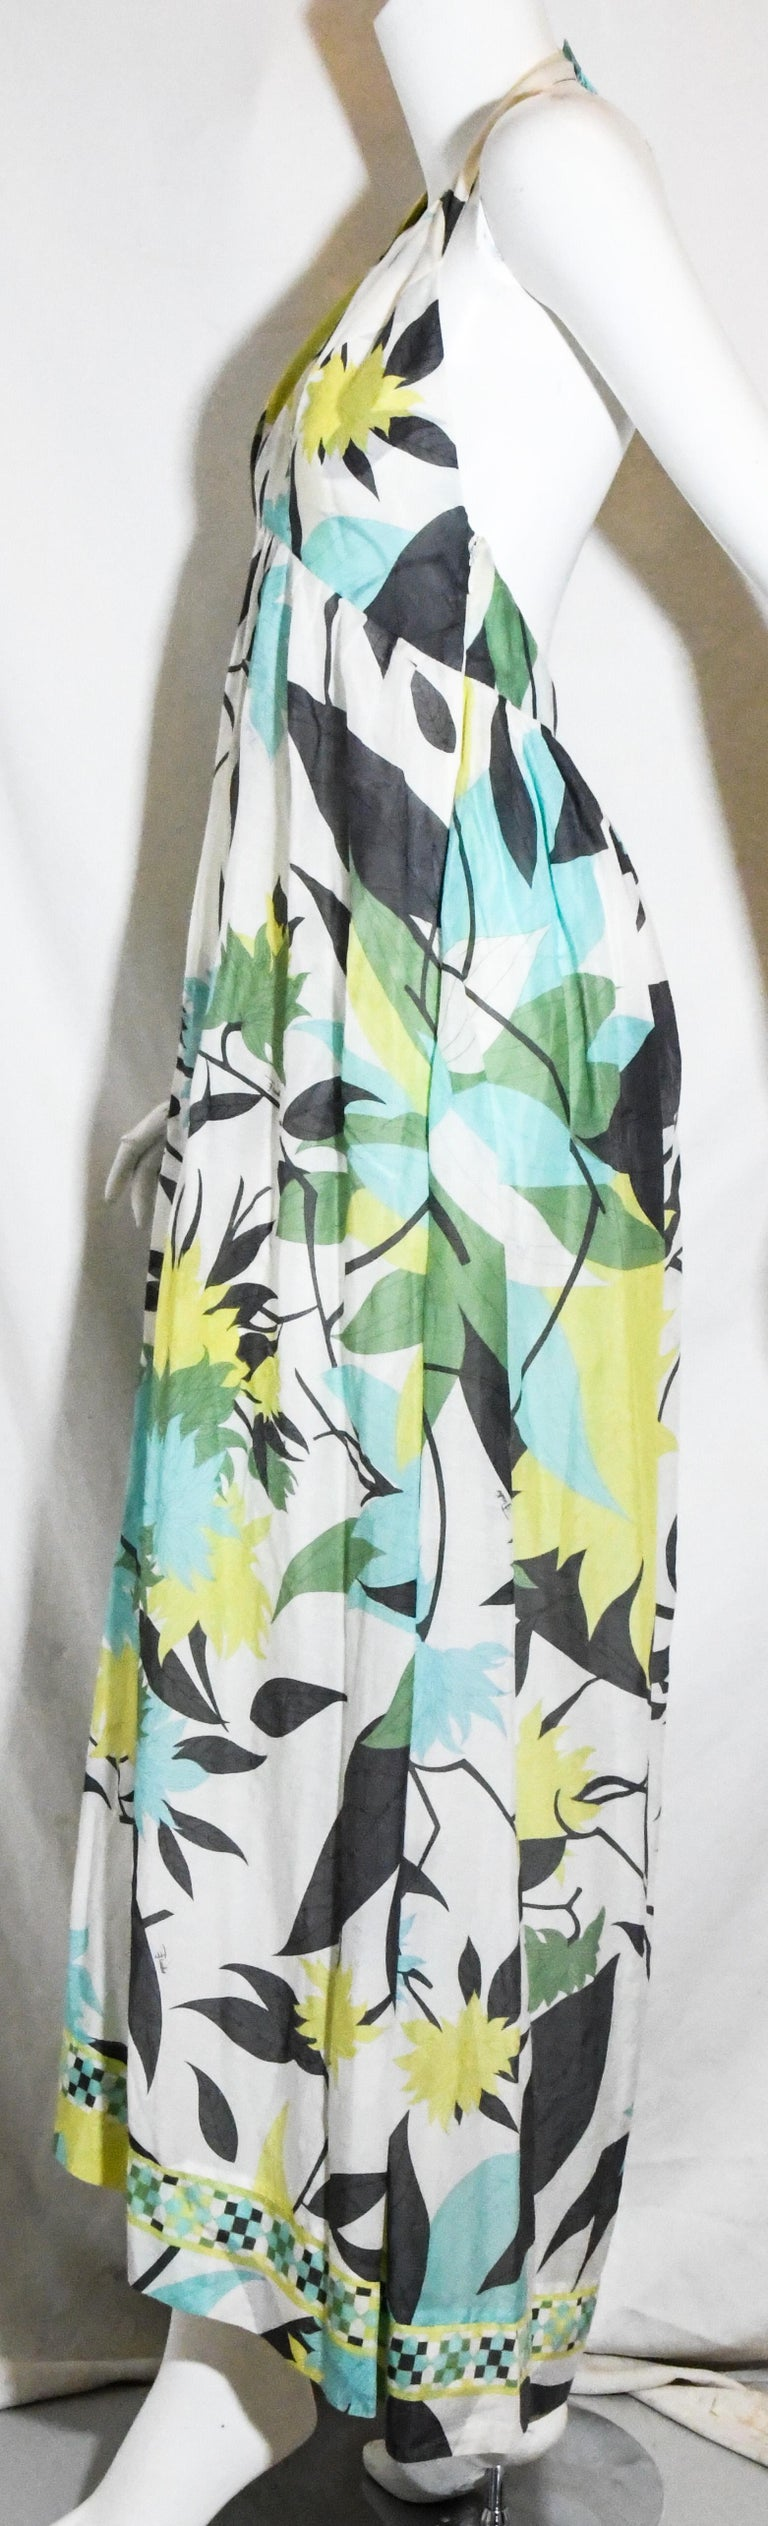 Women's Emilio Pucci Halter V Neck Floral Print Backless Long Dress  For Sale